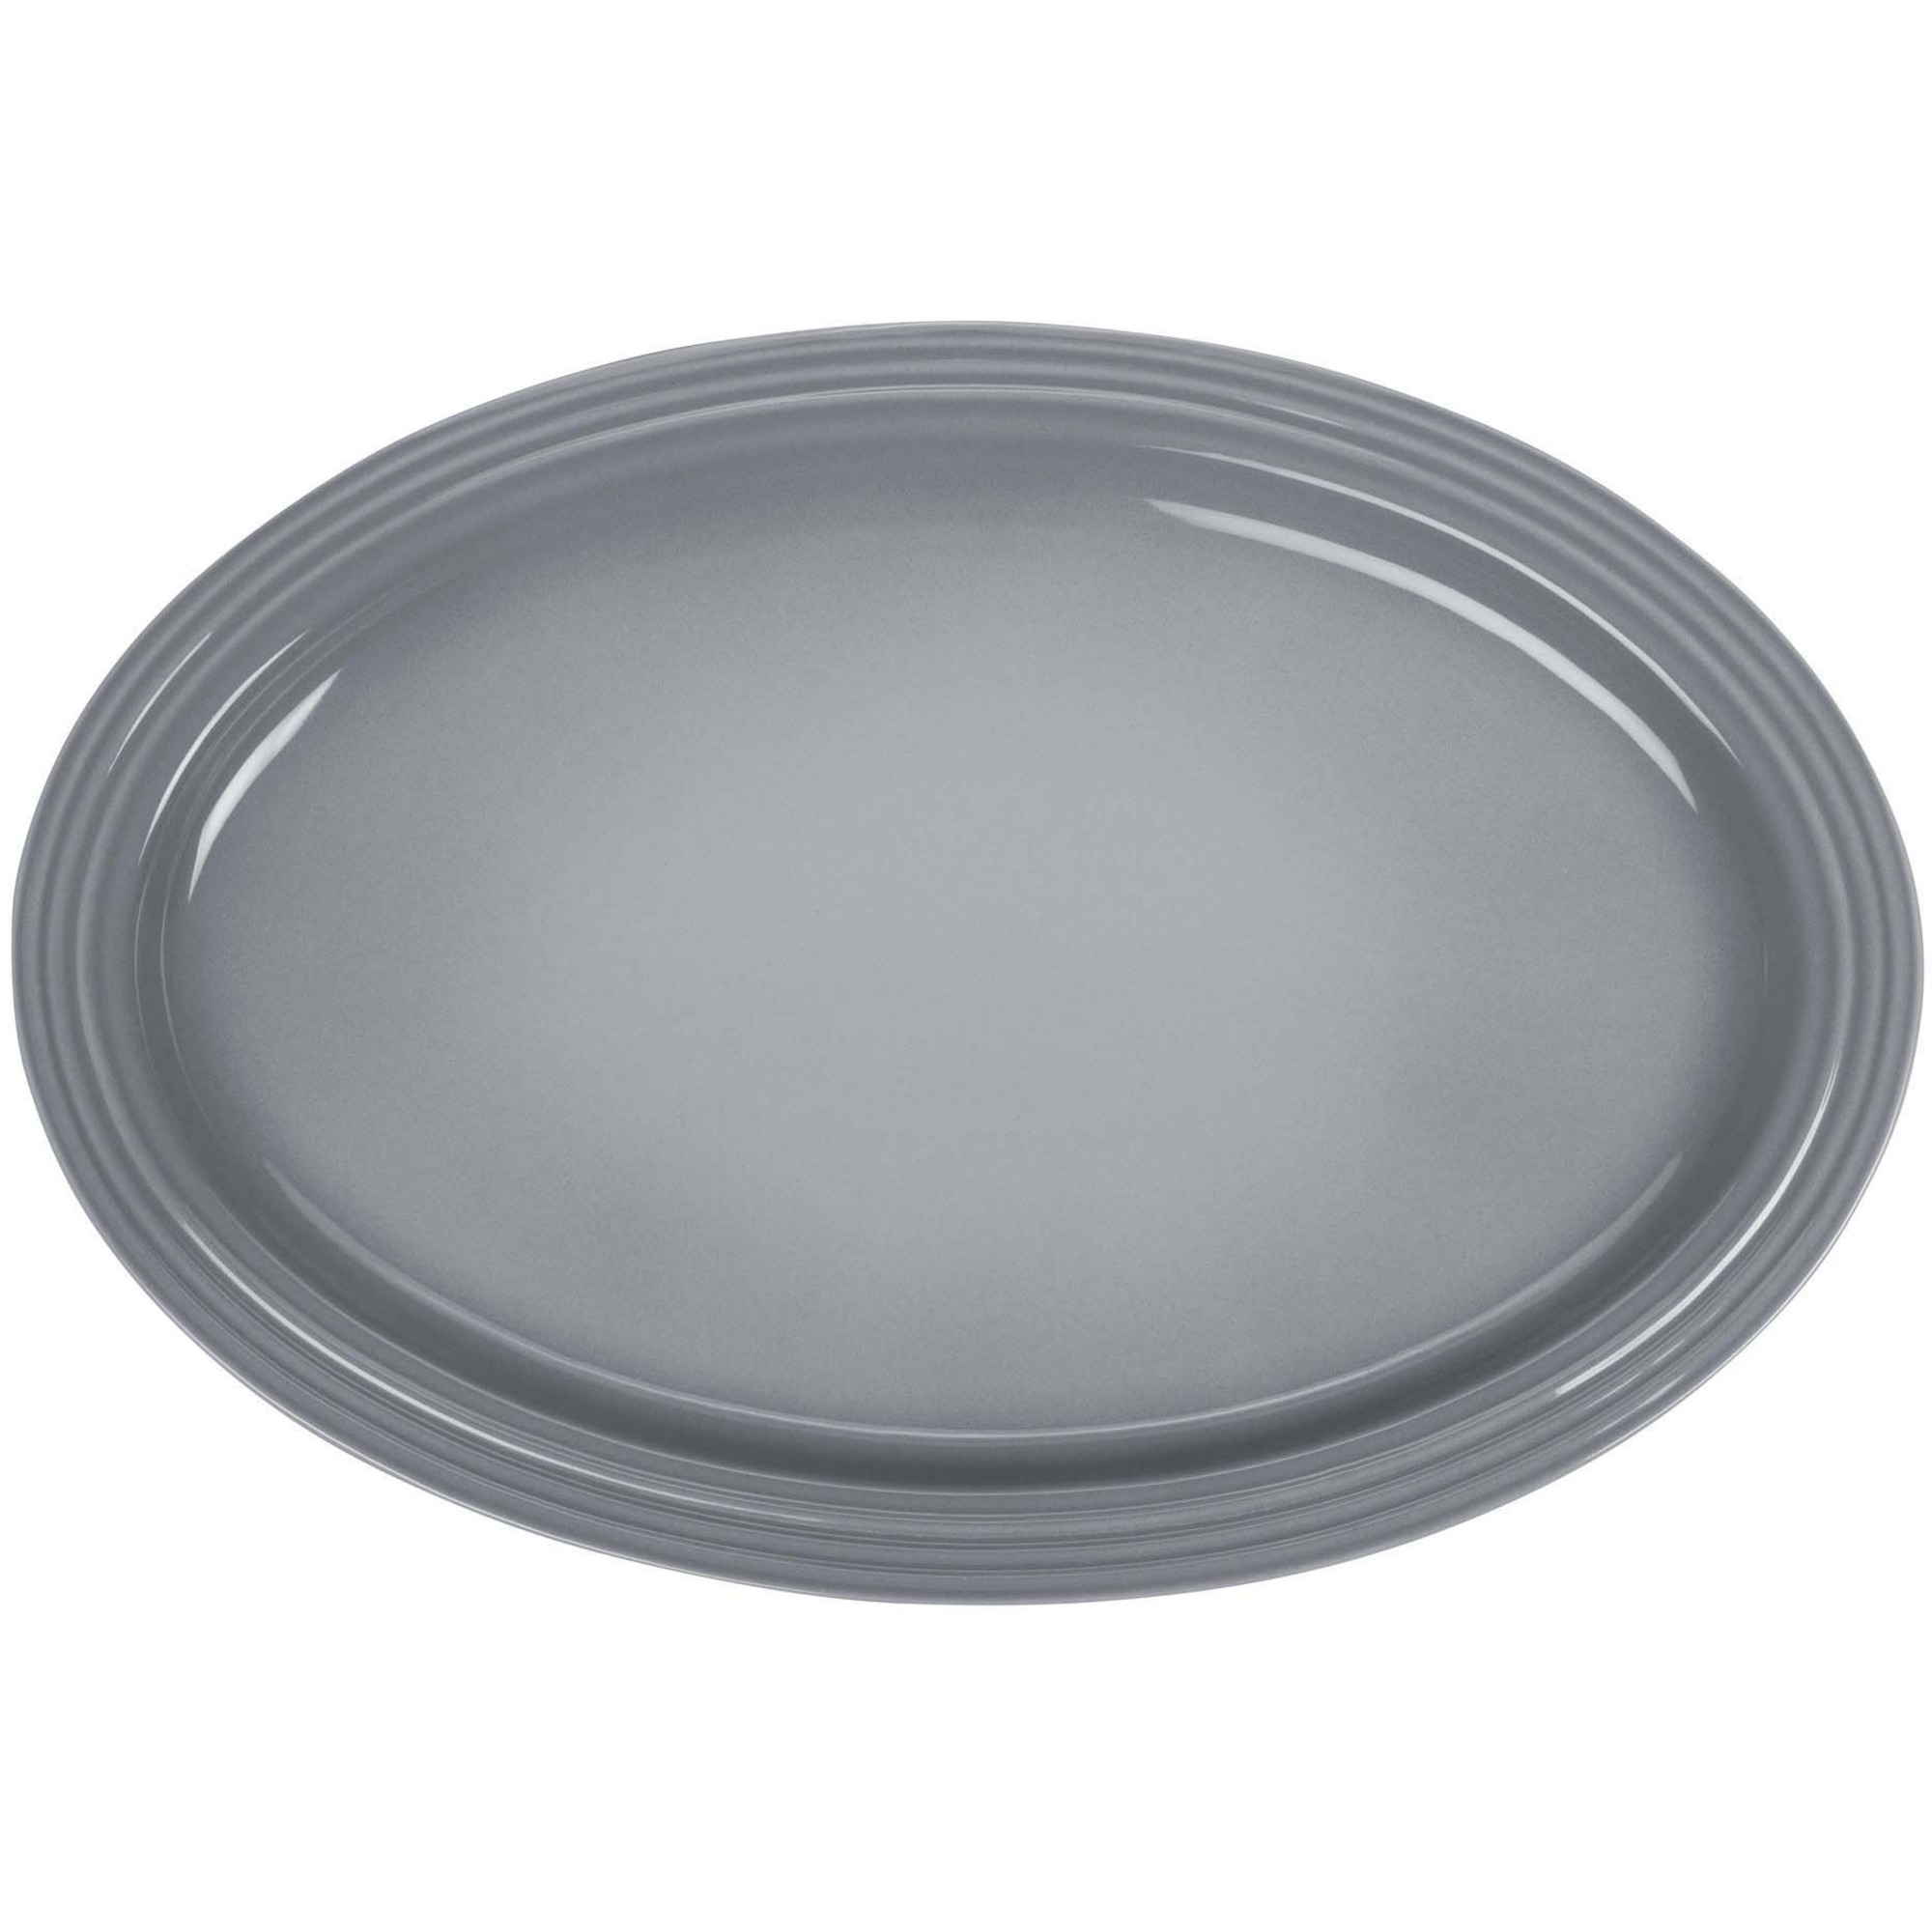 Le Creuset Signature Stort ovalt serveringsfat 46cm Mist Gray